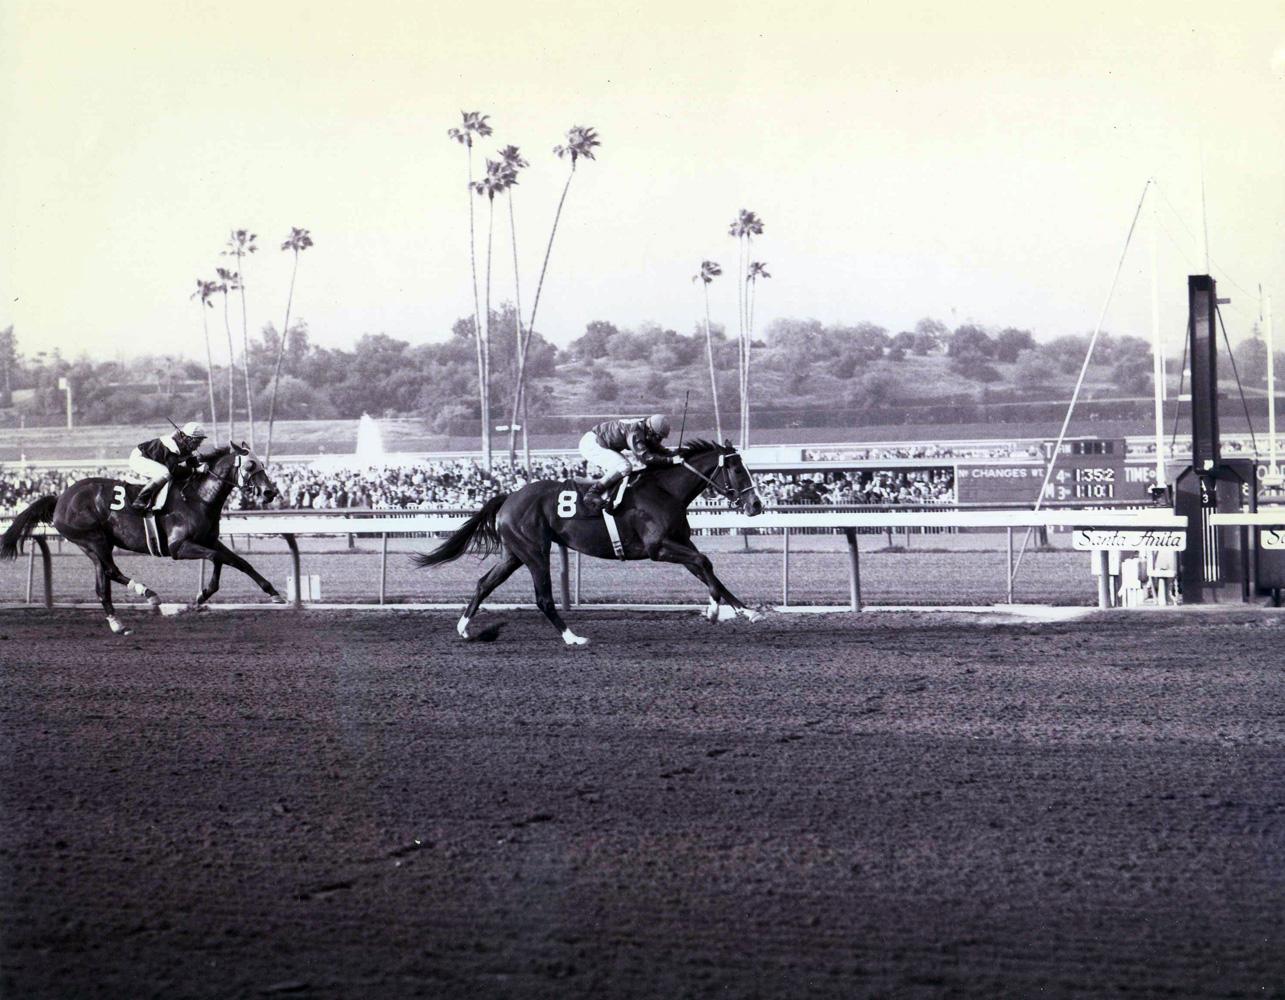 Susan's Girl (Laffit Pincay up) winning the 1973 Santa Margarita Invitational Handicap at Santa Anita Park (Santa Anita Photo/Museum Collection)